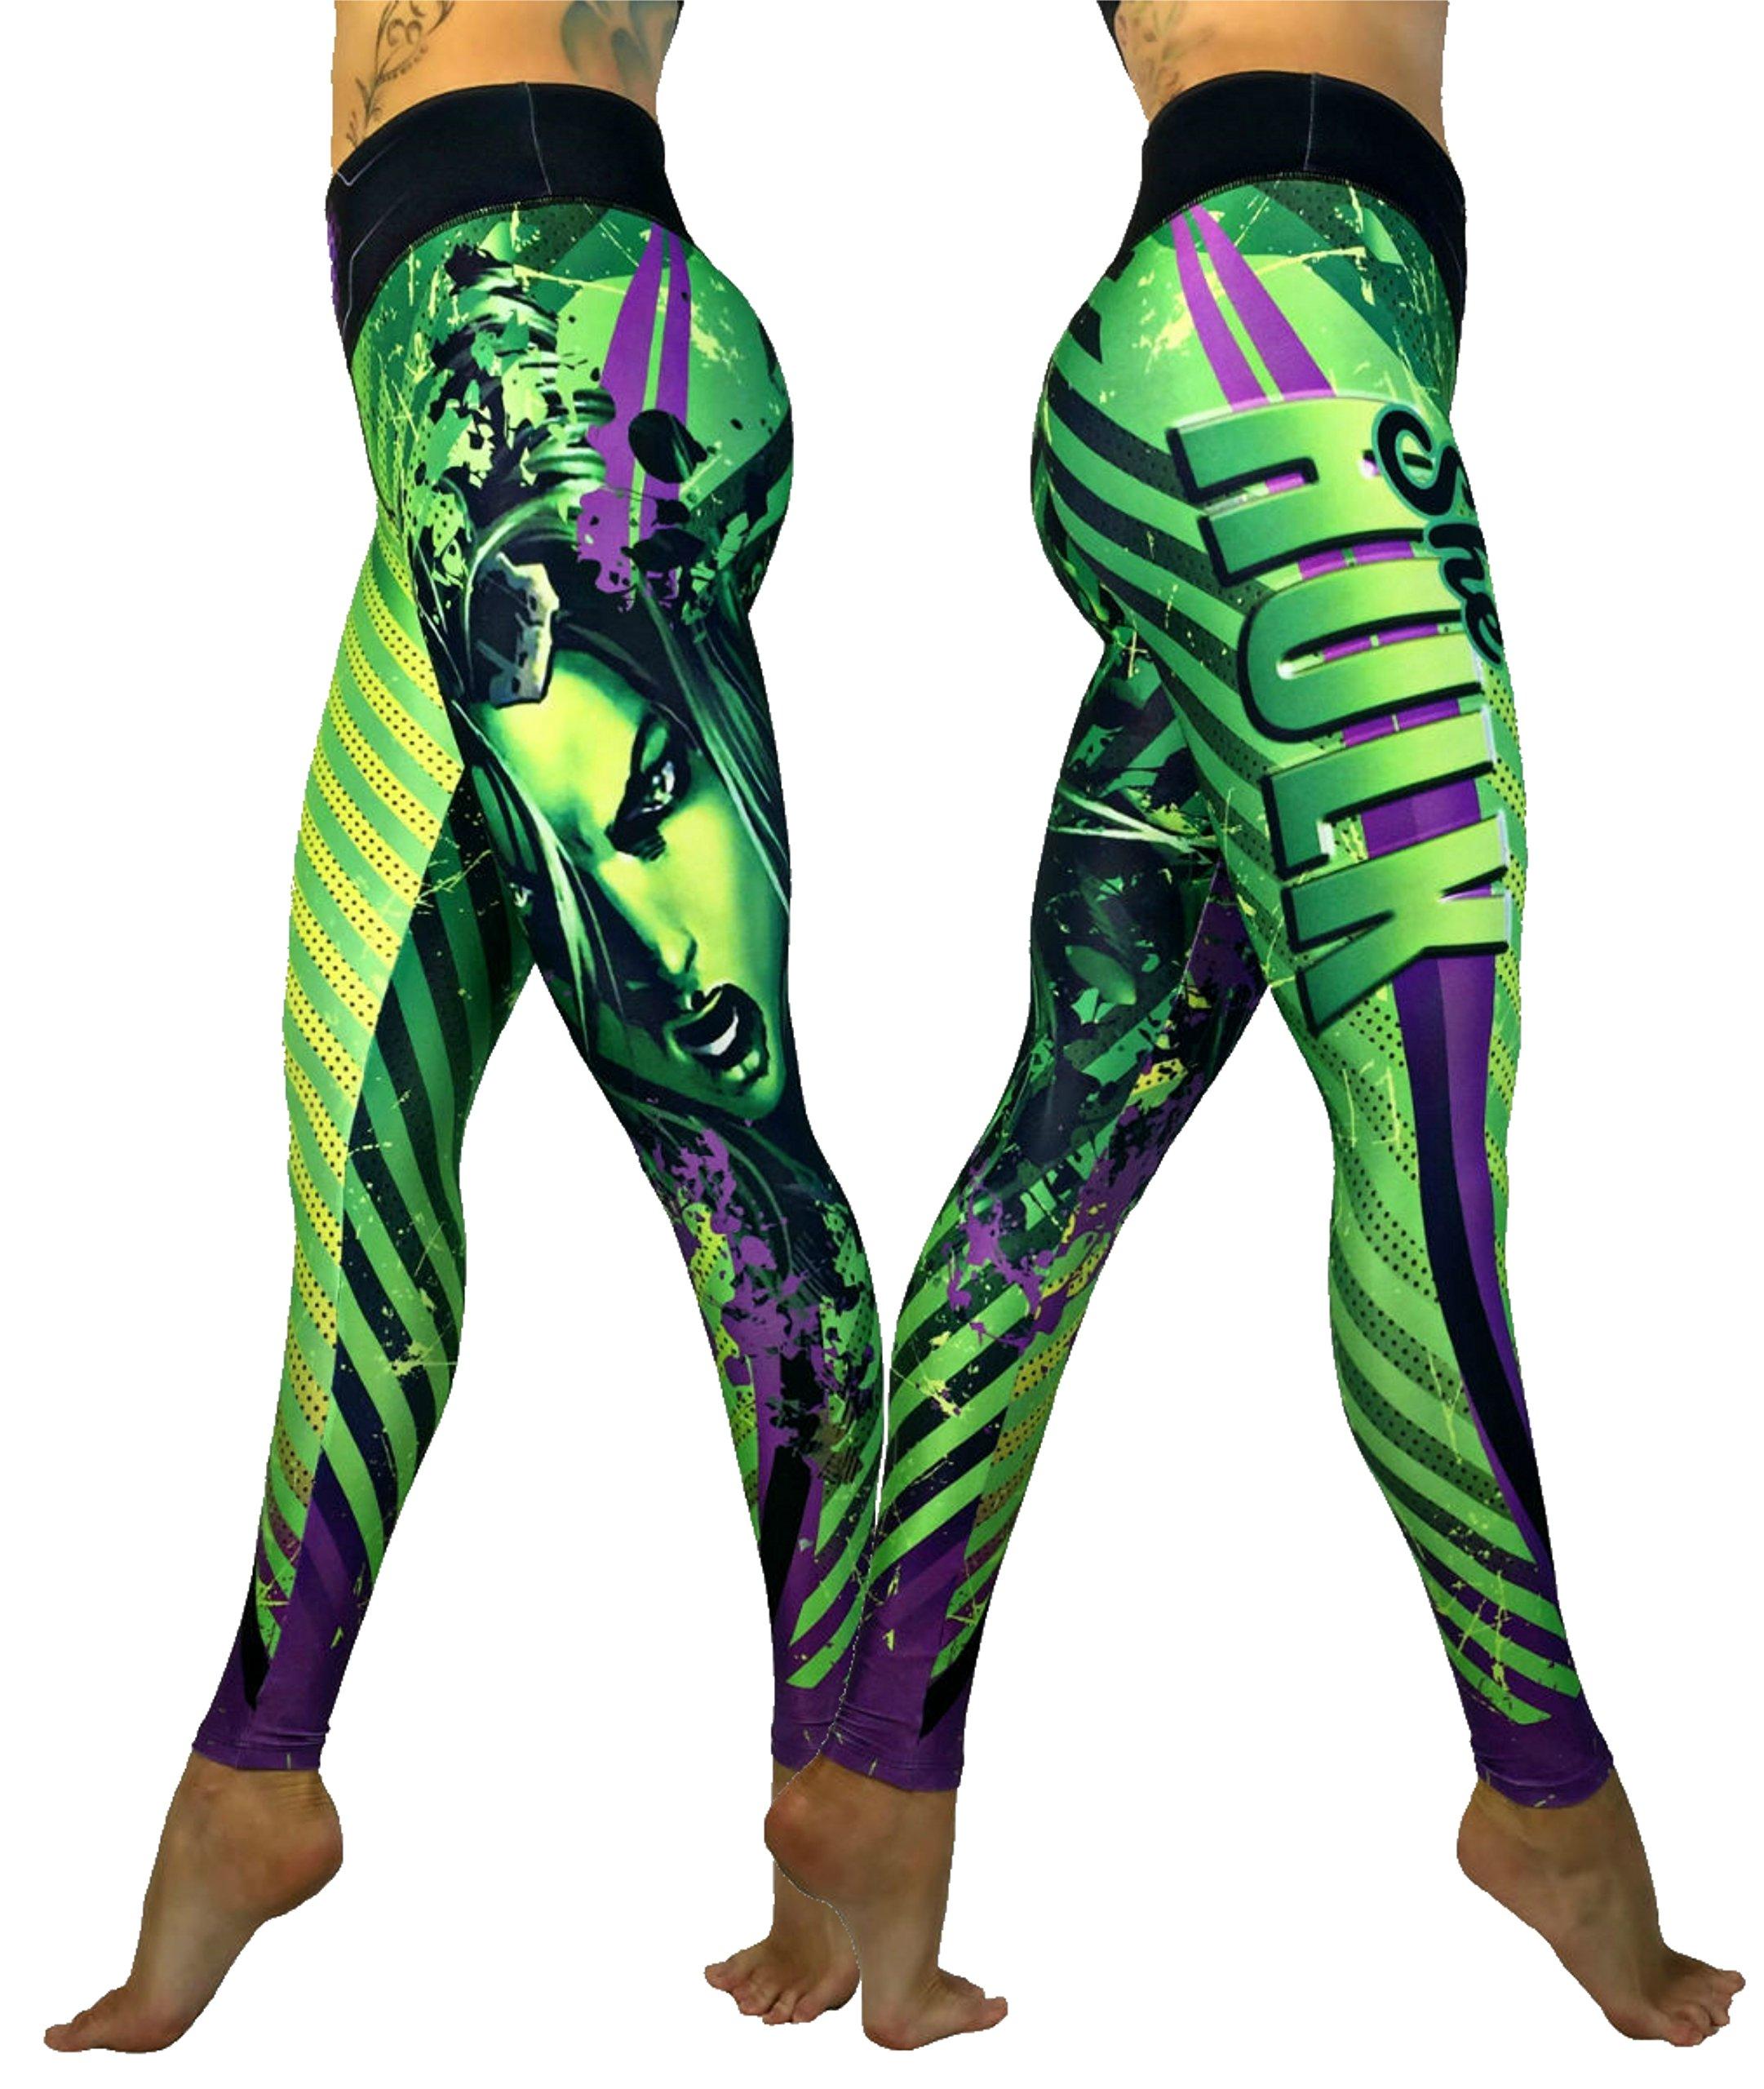 Exit 75 Superhero Many Styles Leggings Yoga Pants Compression Tights (She Hulk Green Sm/Med)